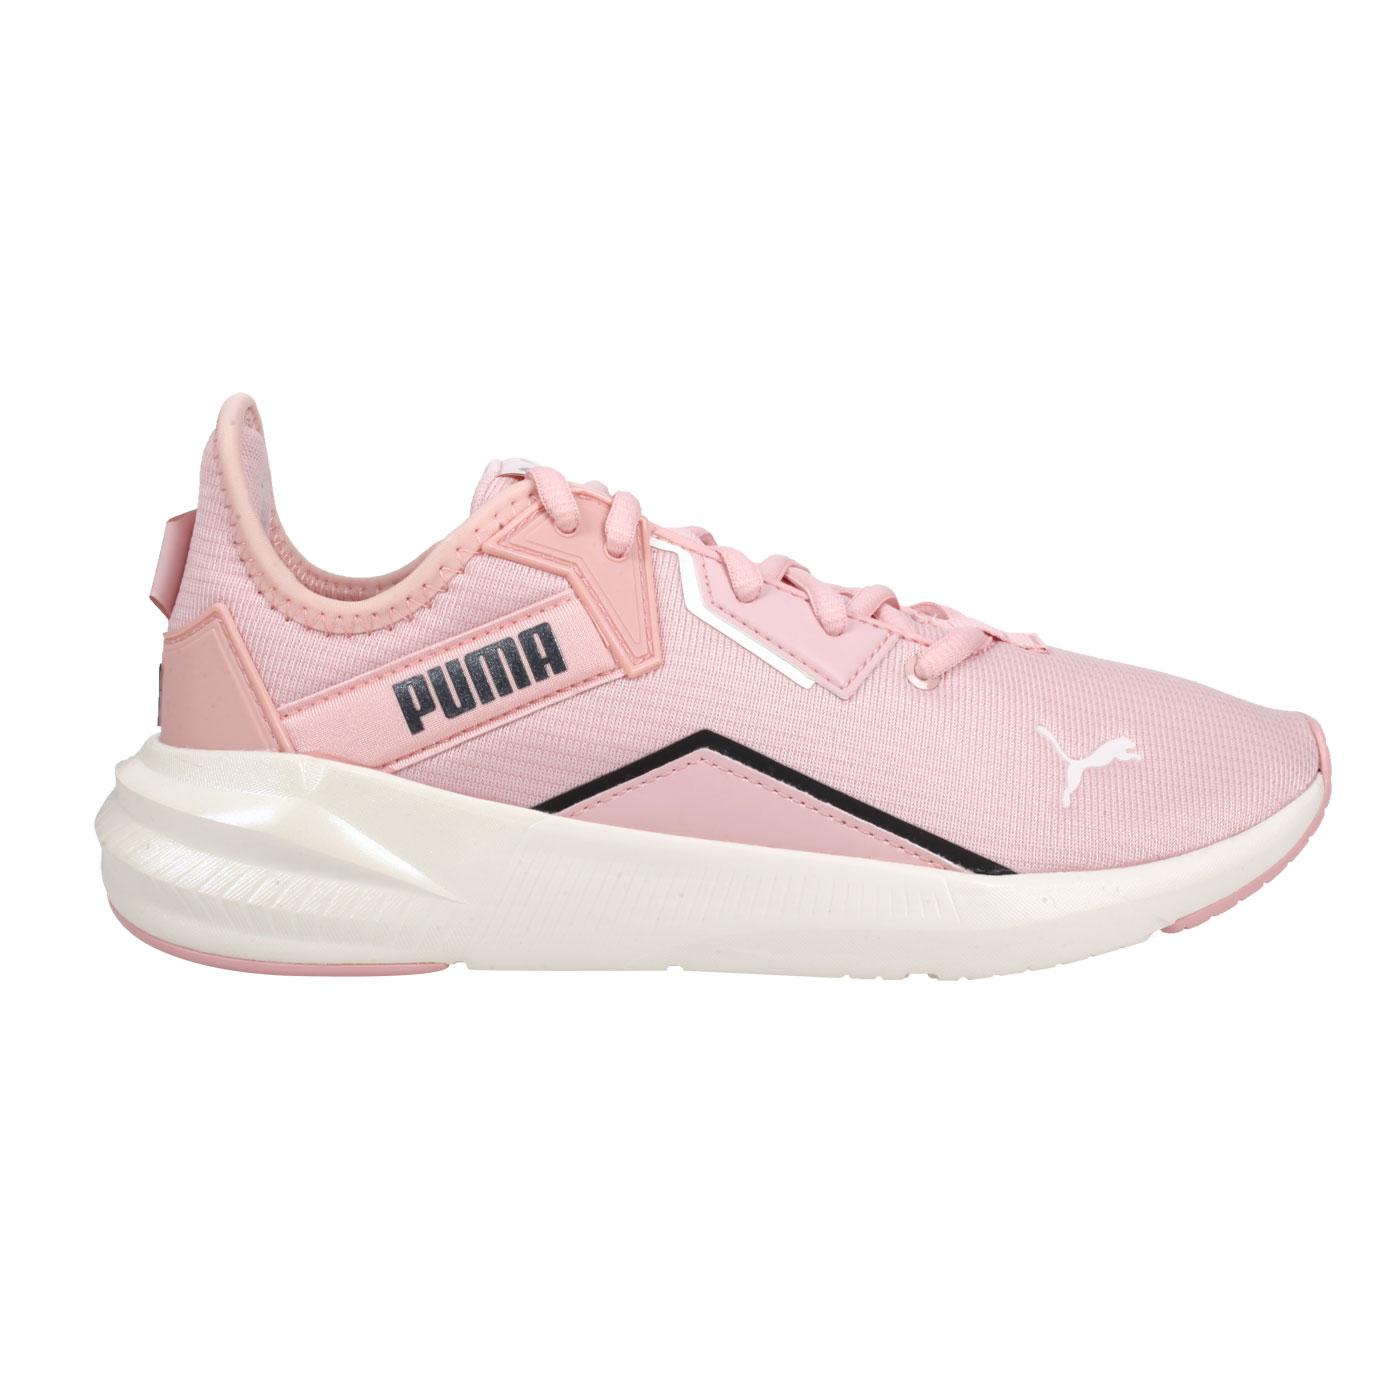 PUMA 女款休閒運動鞋  @Platinum Shimmer Wn's@19377201 - 淺粉黑白